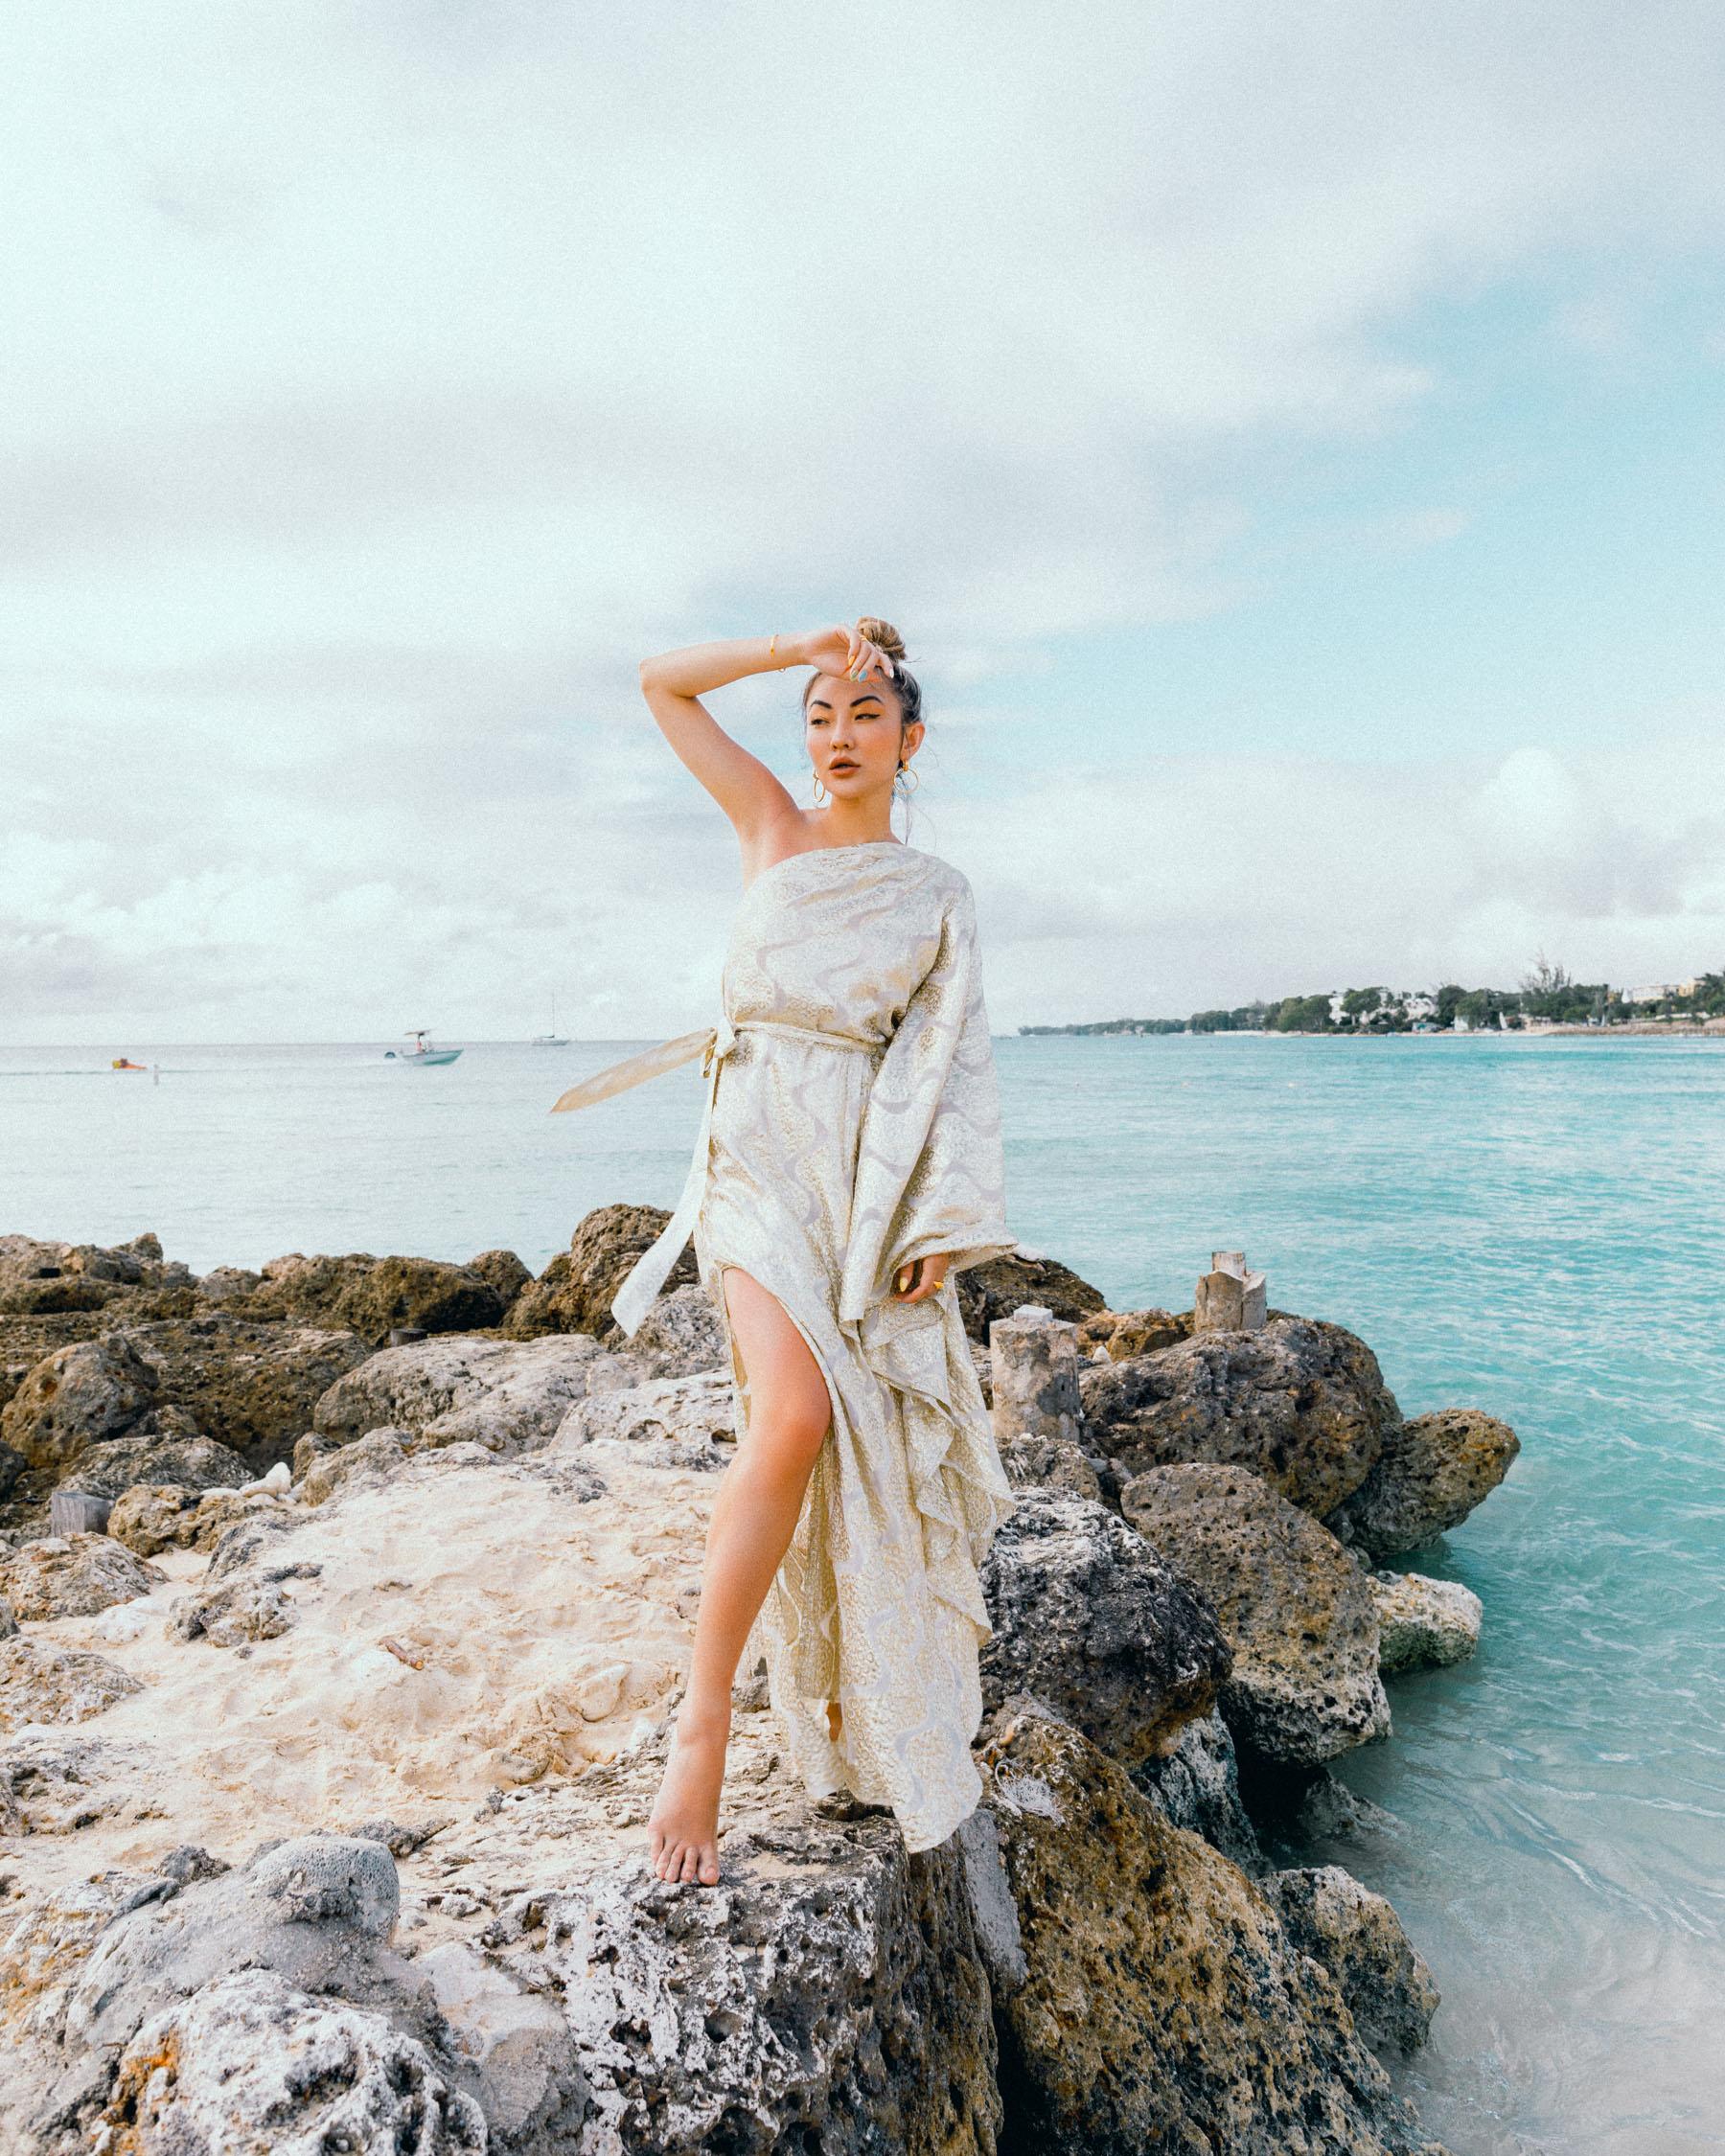 affordable it-girl brands, one-shoulder dress, vacation style // Notjessfashion.com